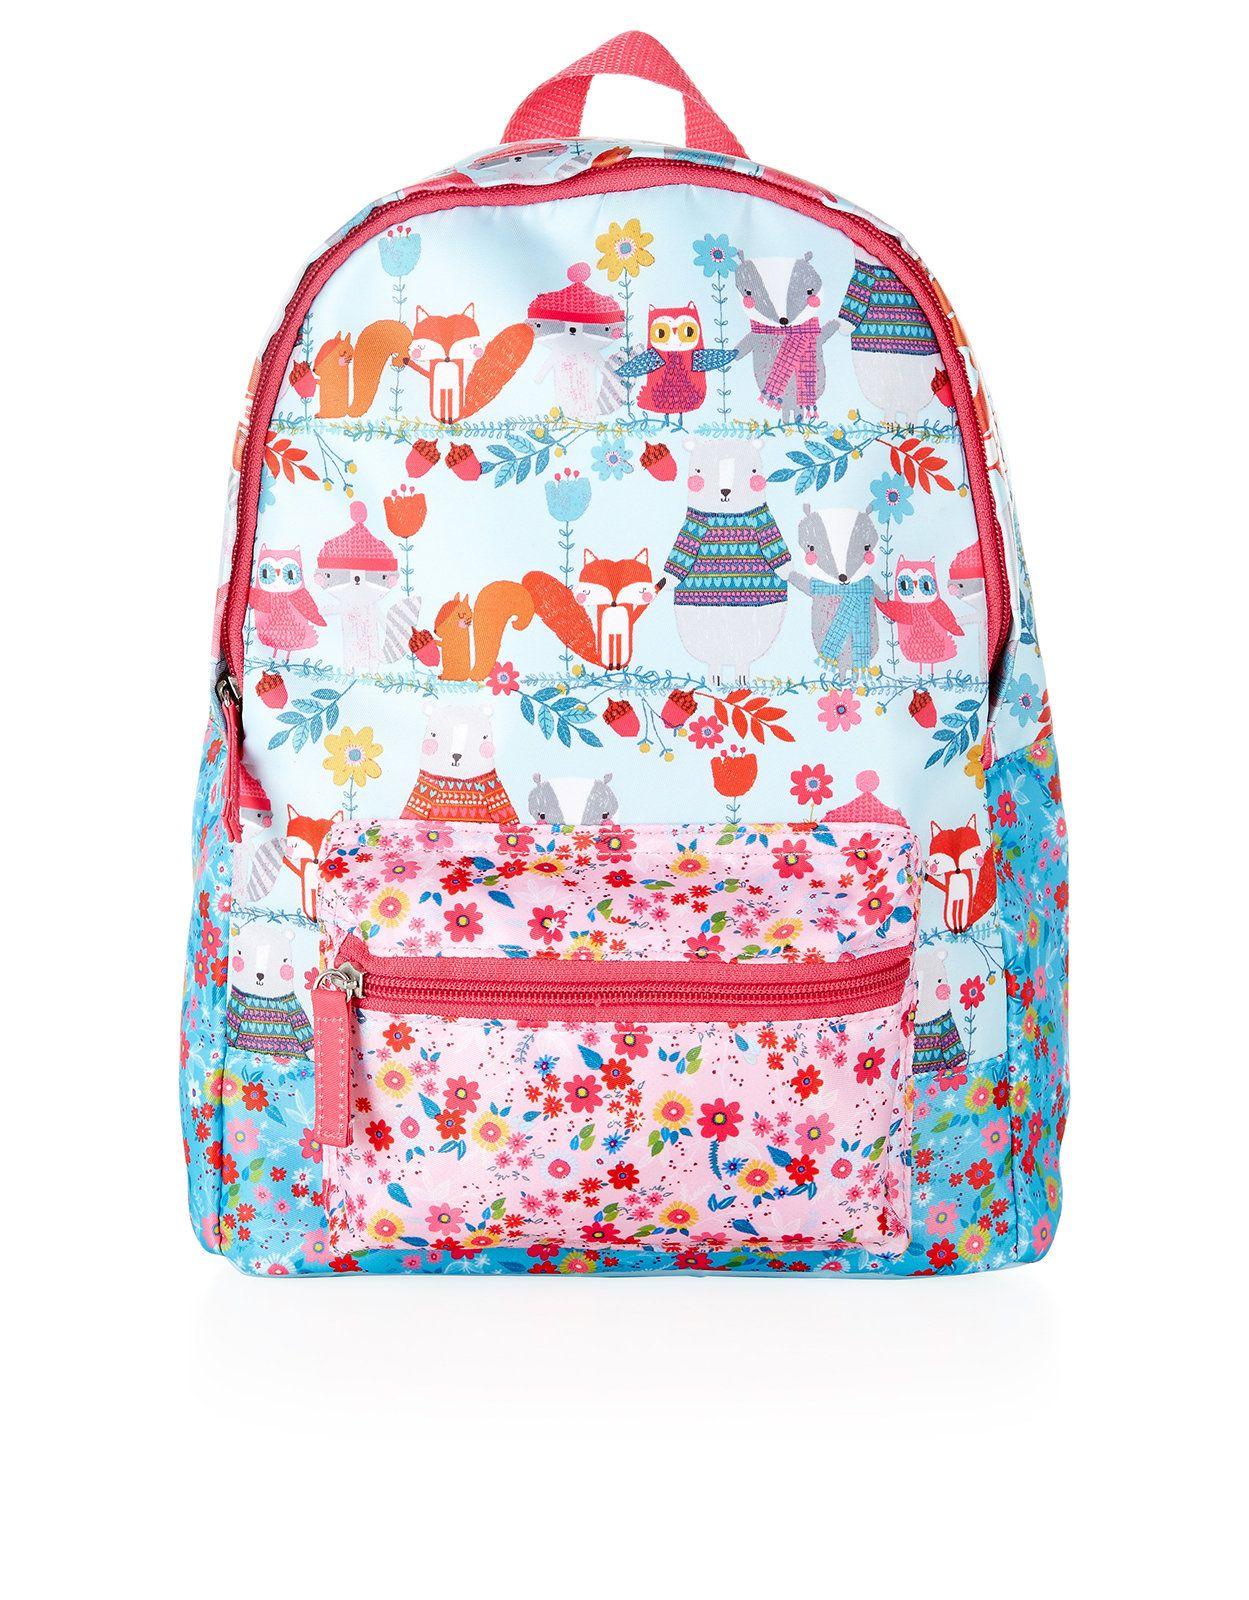 c2869b8cdb Woodlands Friends Backpack